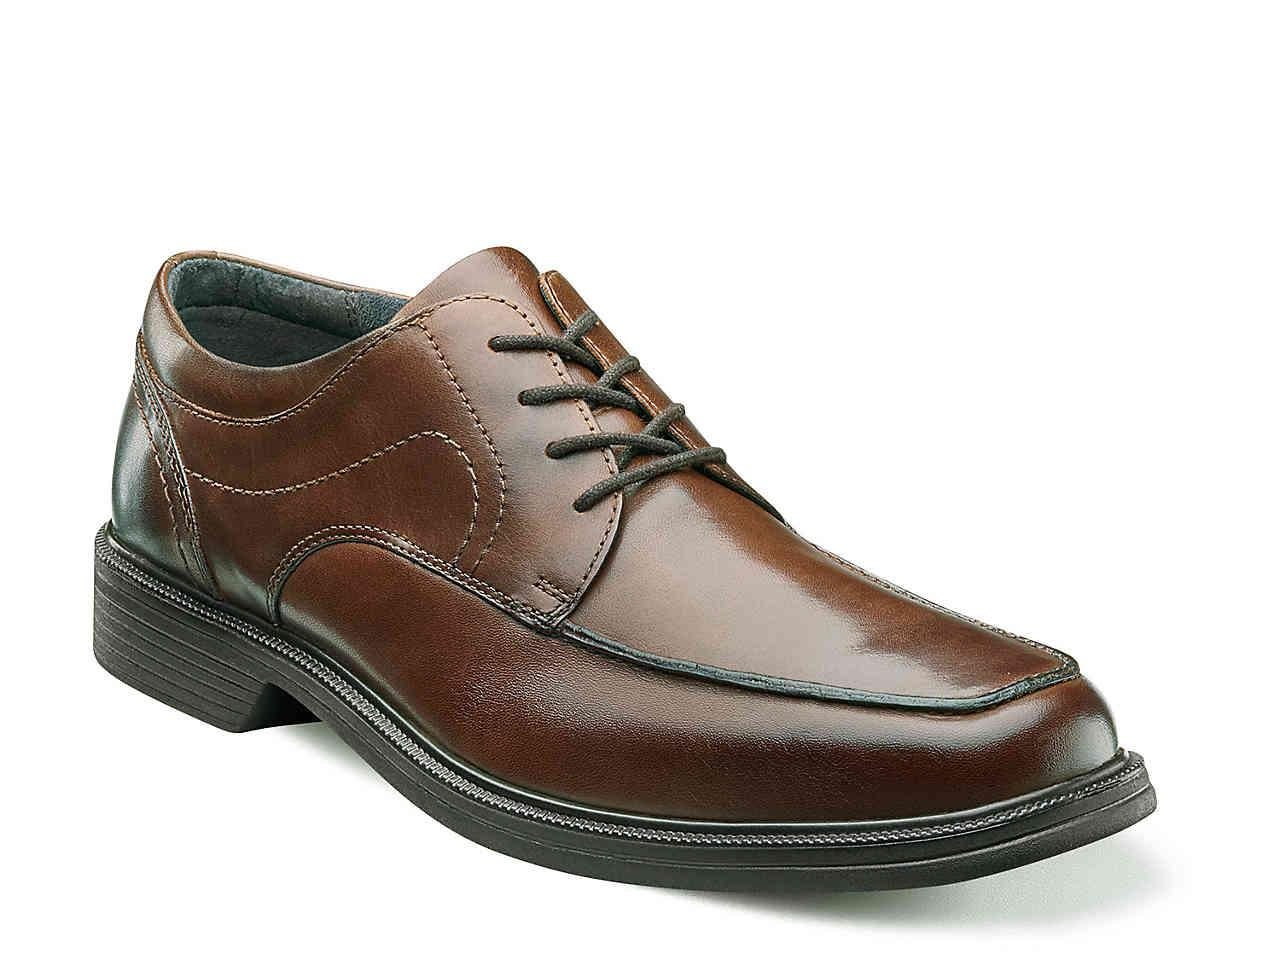 Nunn Bush Carlin 84562 Moc Toe Oxford with KORE(Men's) -Black Leather Get To Buy Cheap Price PcNMkF9n9g